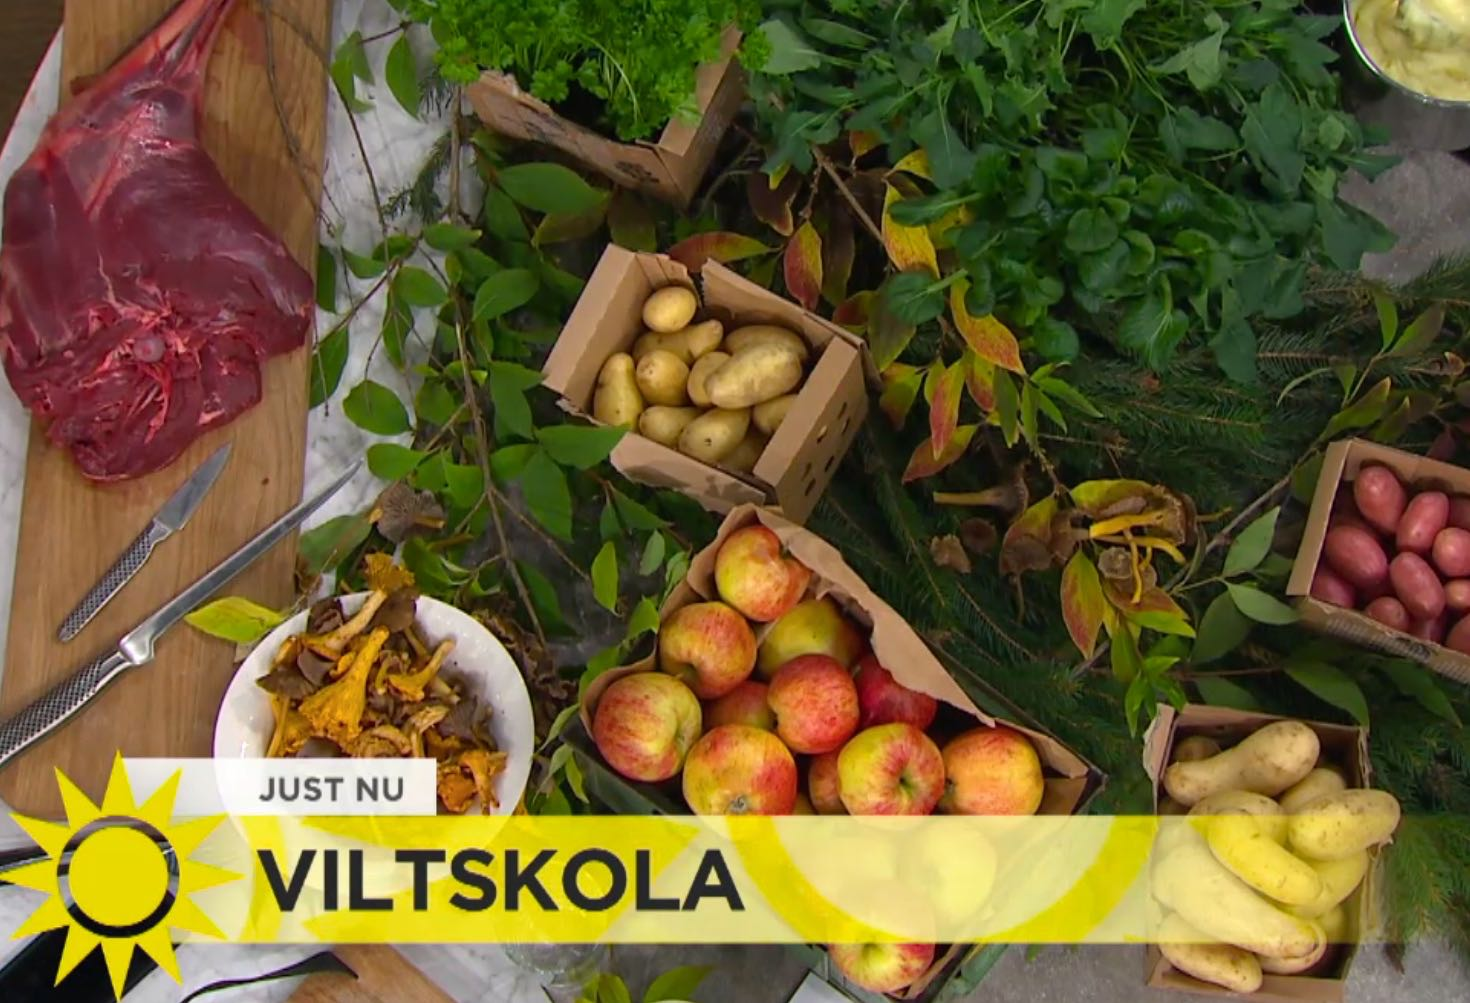 Svenskt viltbord med rådjur, lingon, svamp & örter